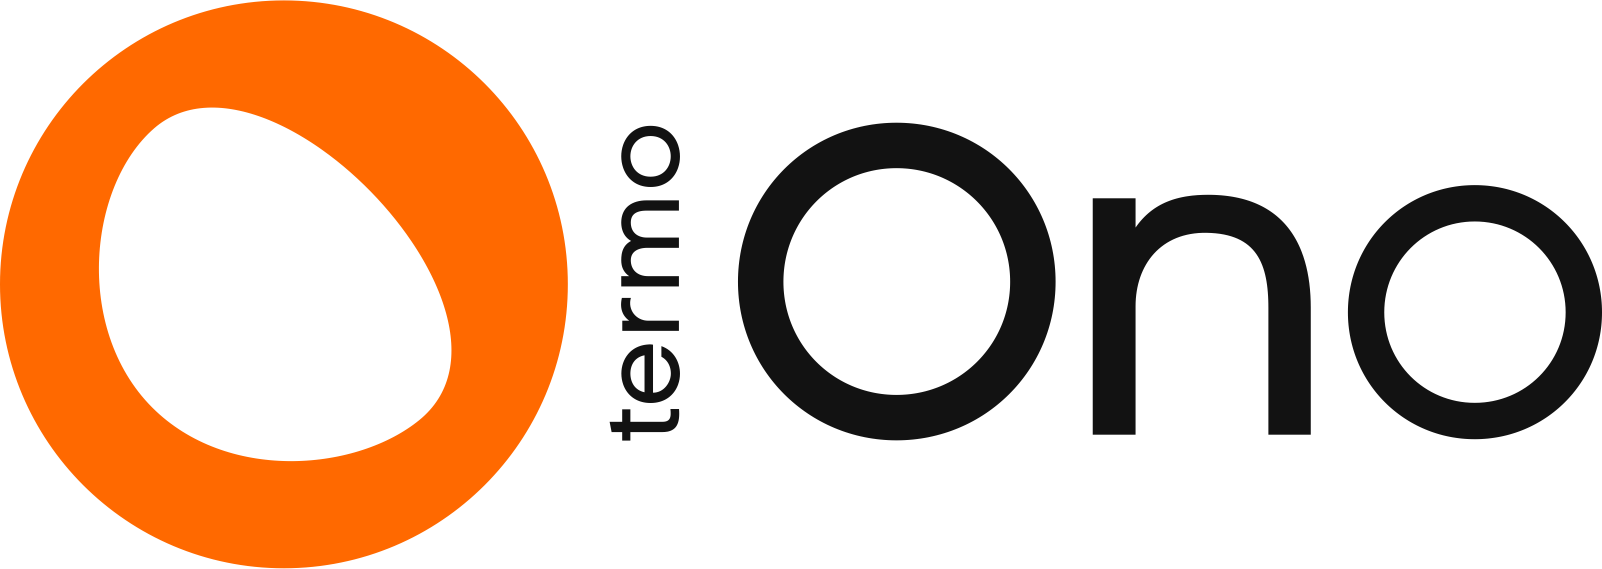 TermoOno – termoplásticos, água e ambiente, lda